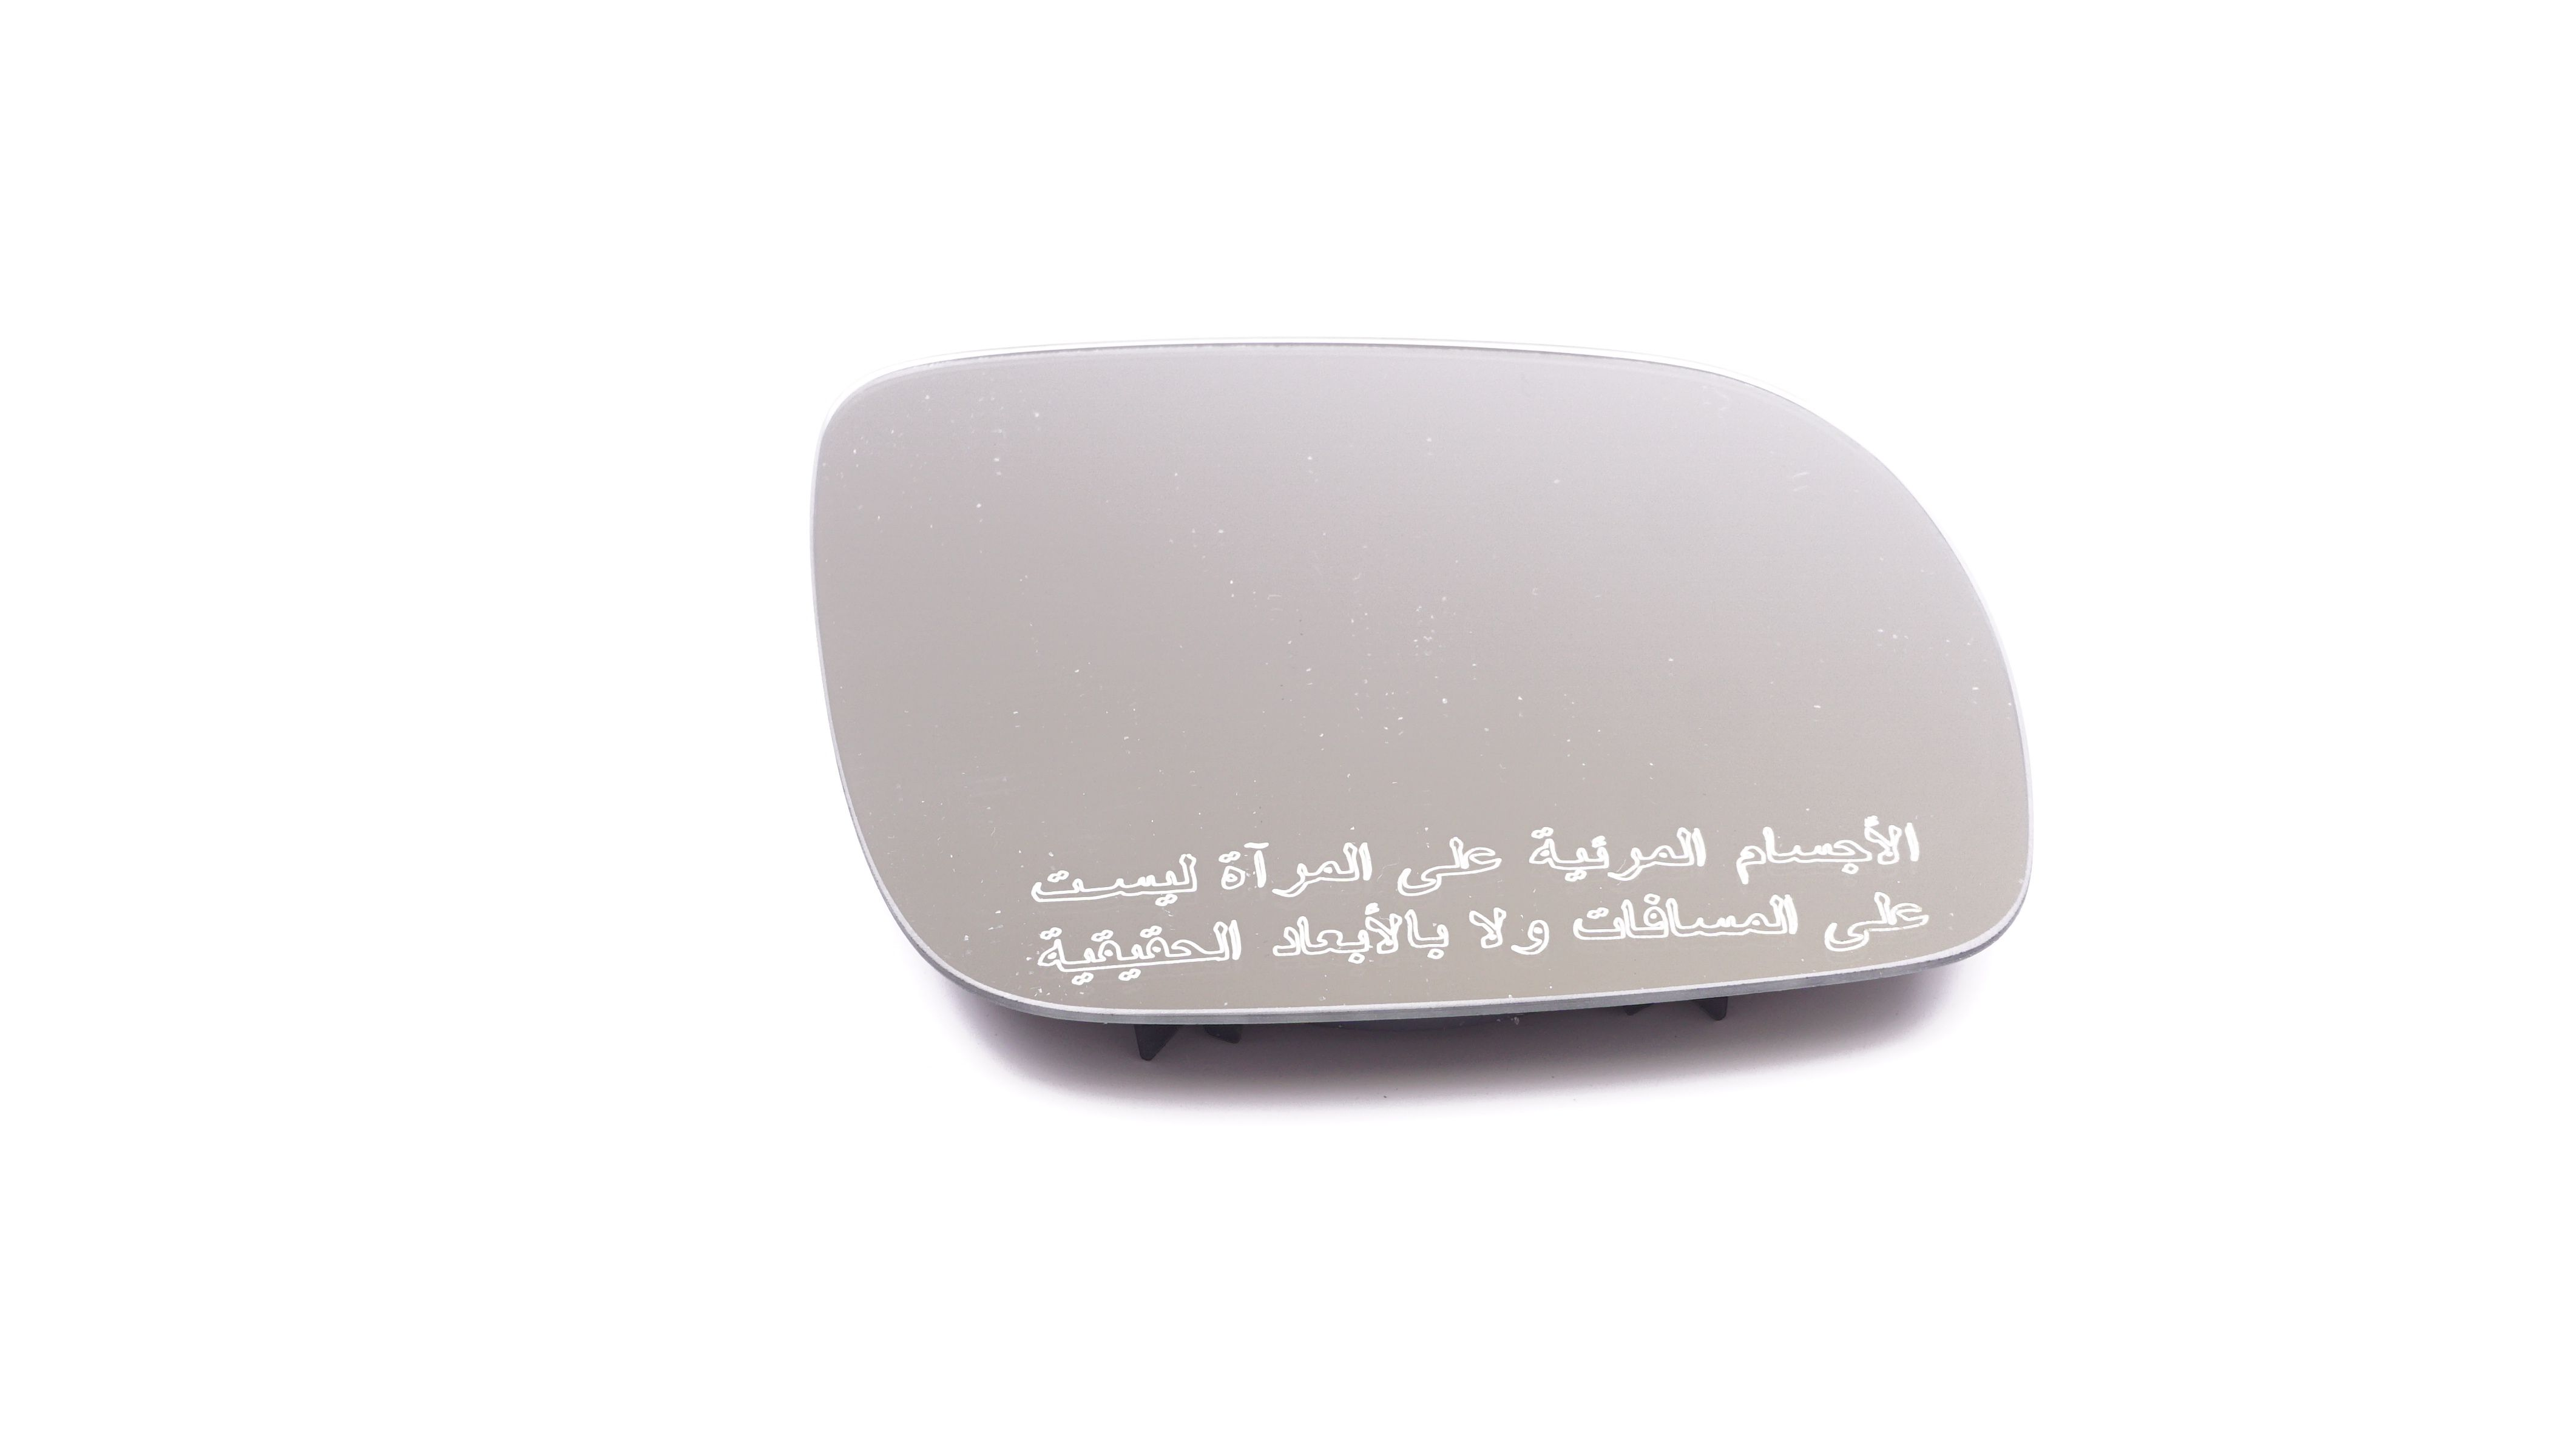 3B1 857 522 E Spiegelglas rechts mit arabischer Beschriftung